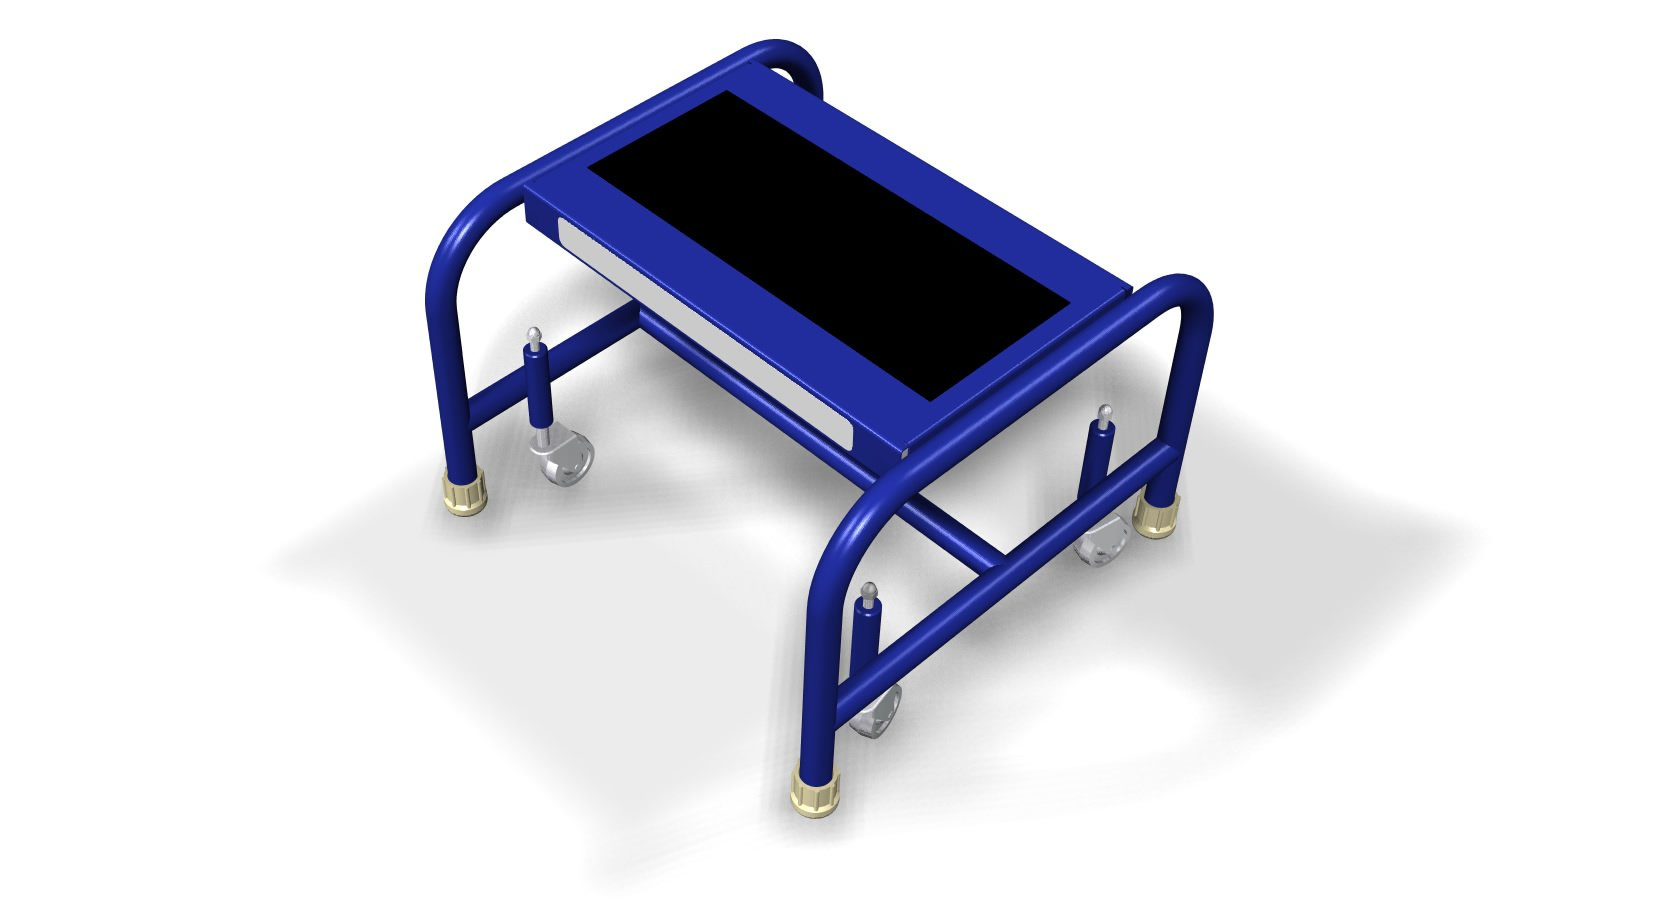 Tri-Arc WLSR001163-WM 1-Step Mobile Steel Step Stand with Anti-Slip Tread, 16-Inch Wide